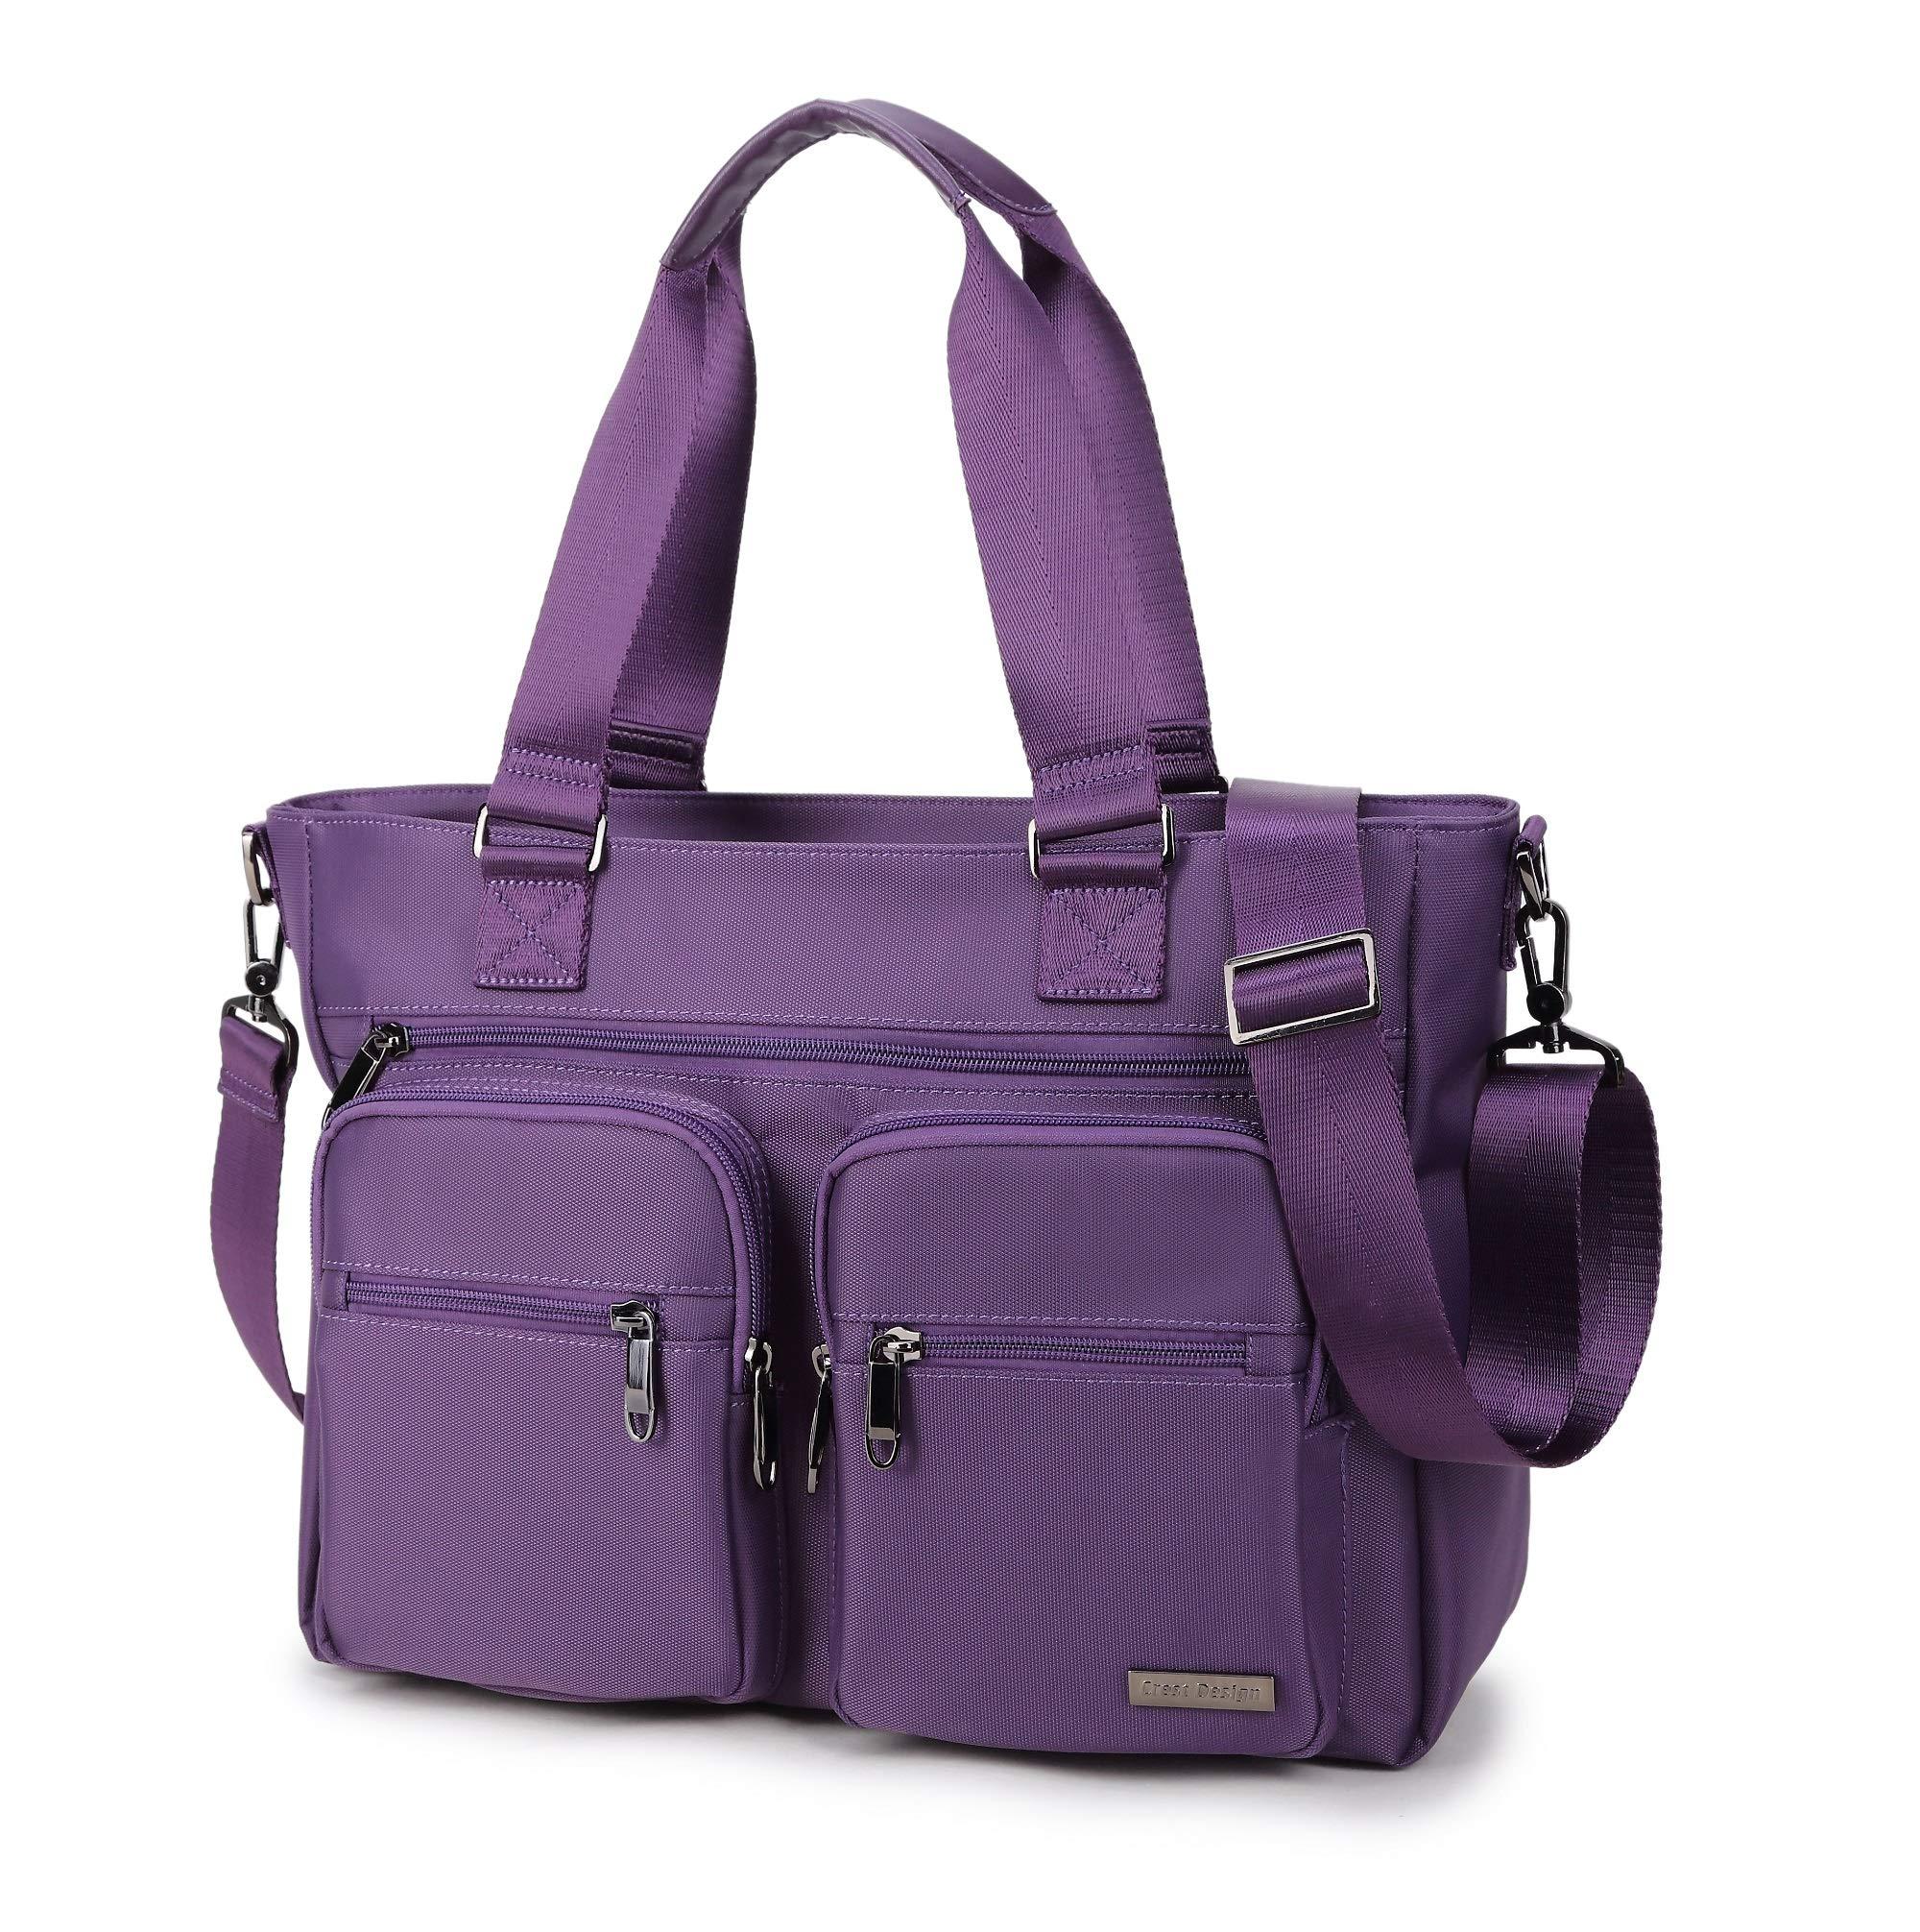 Crest Design Water Repellent Nylon Shoulder Bag Handbag Tablet Laptop Tote as Travel Work and School Bag. Perfect Nursing Tote to Carry Medical, Nursing Supplies (Orchid)